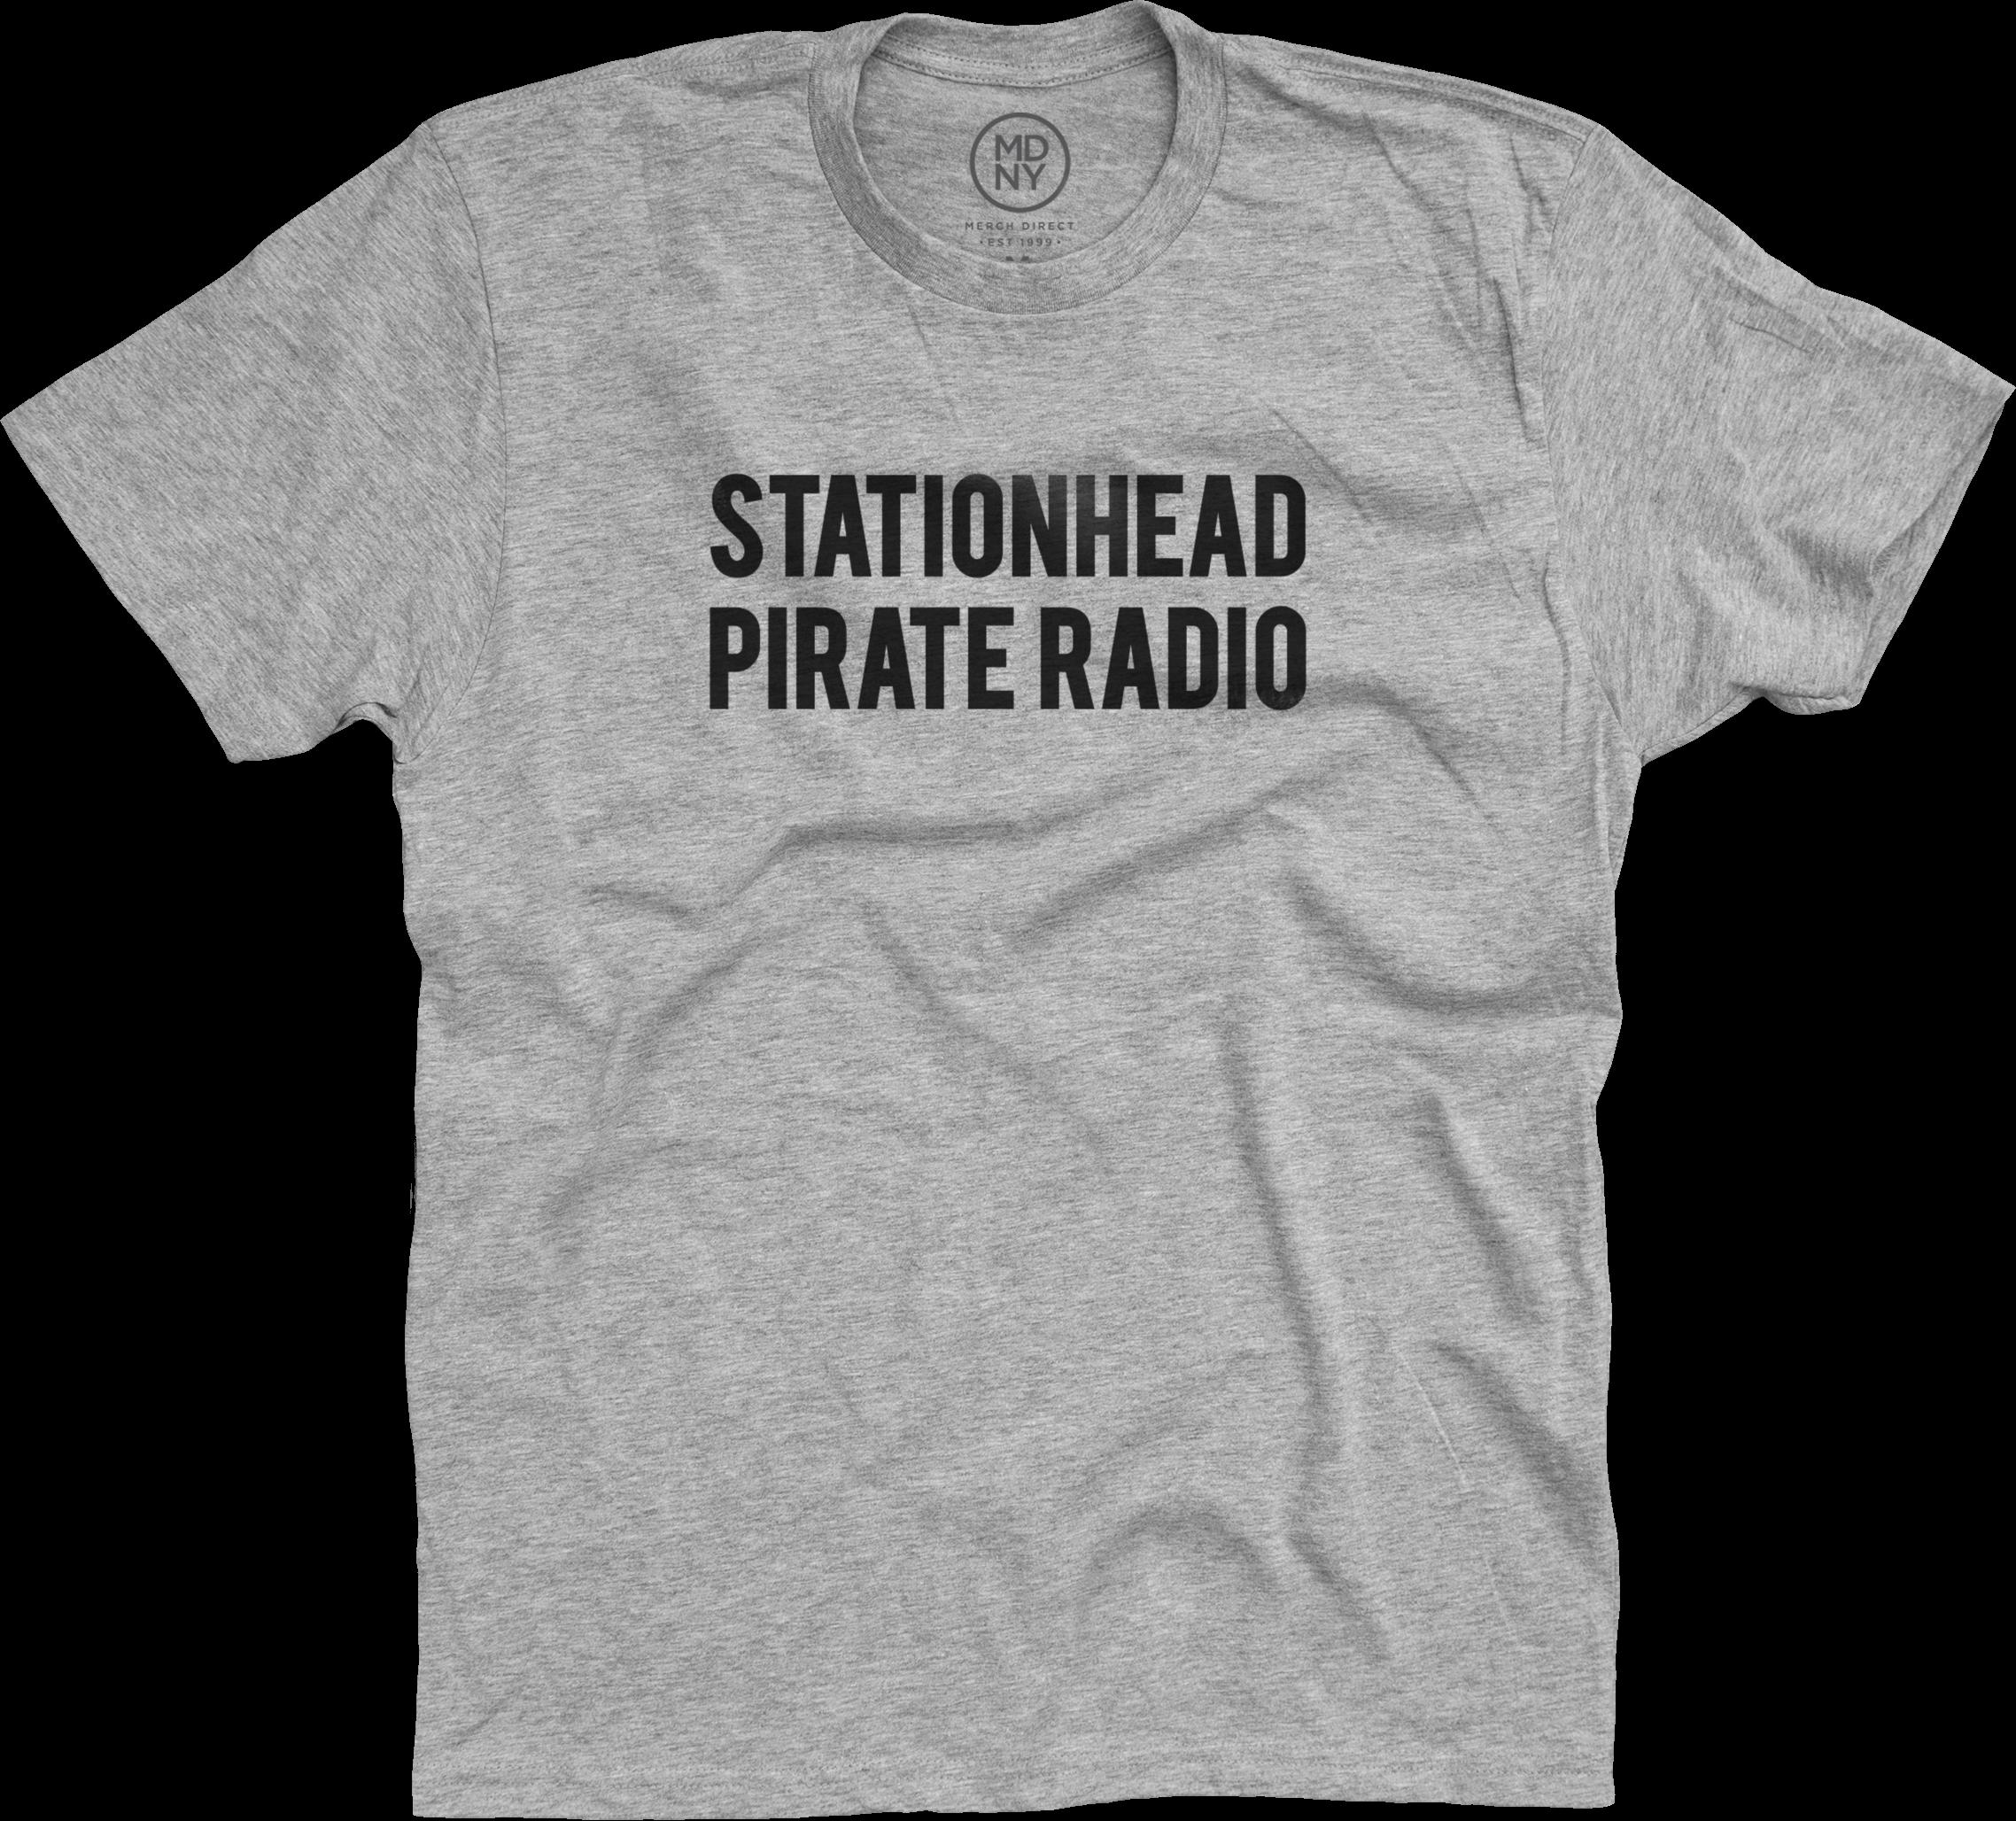 STATIONHEAD PIRATE RADIO